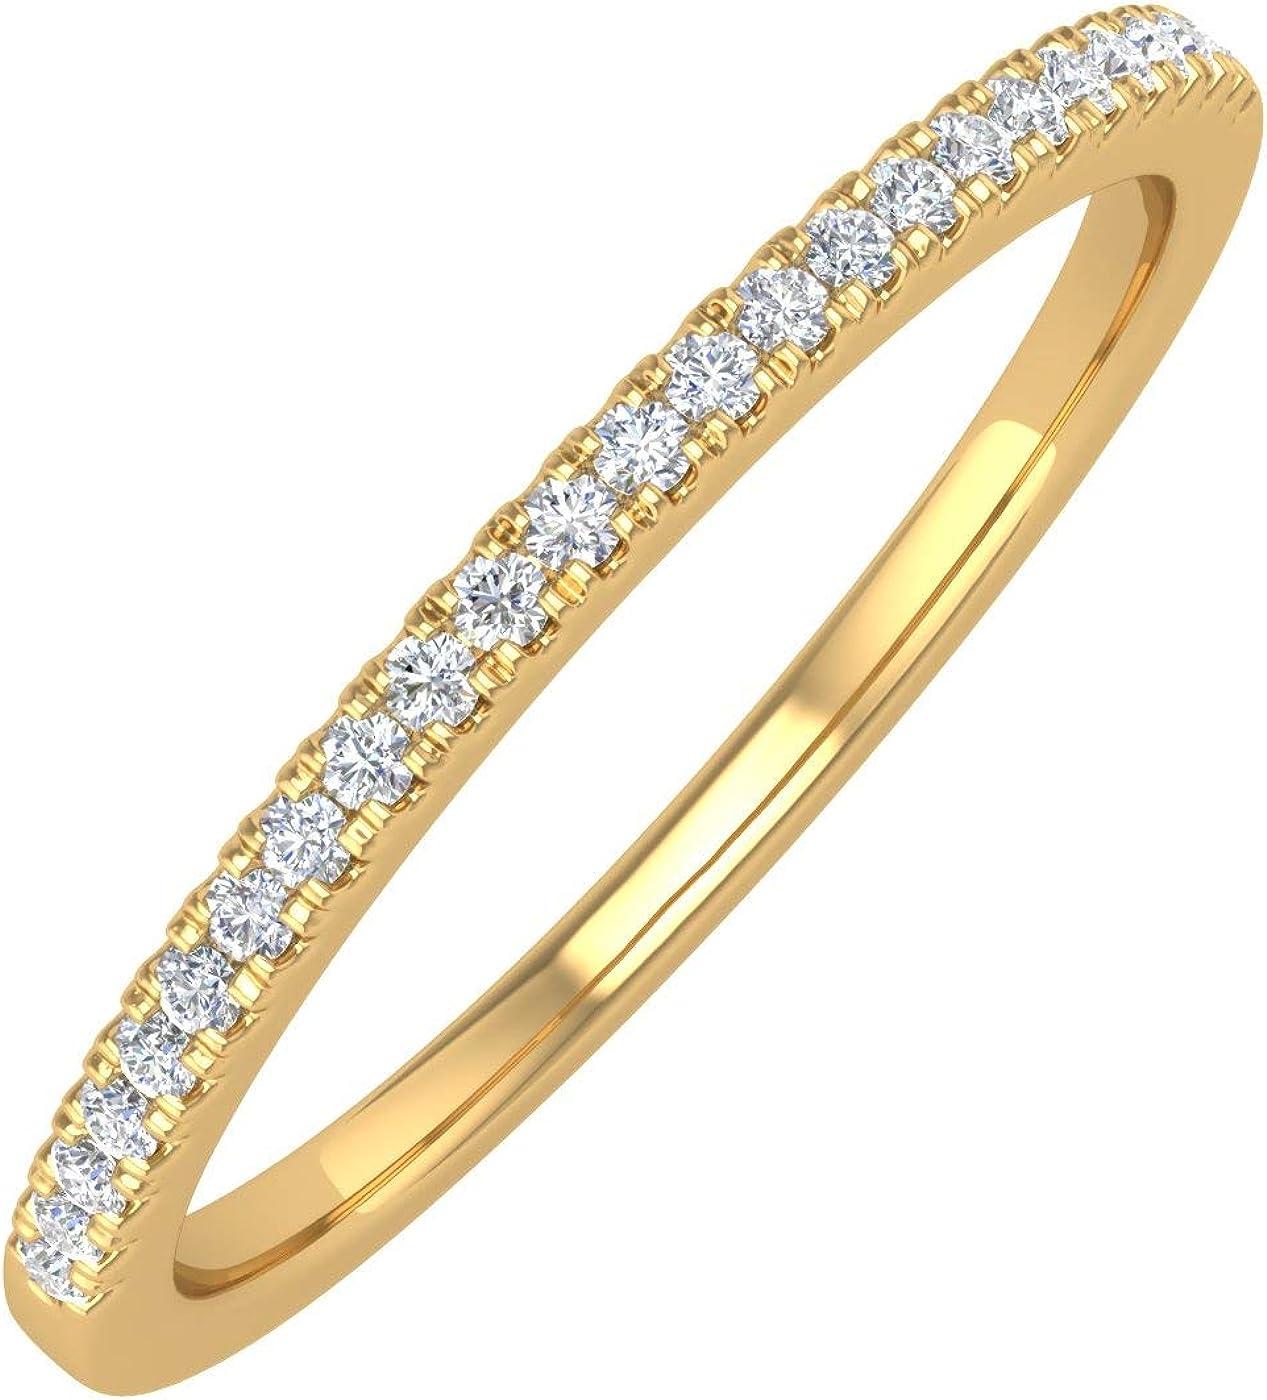 1/10 Carat (ctw) 14K Gold Ladies Diamond Stackable Anniversary Ring